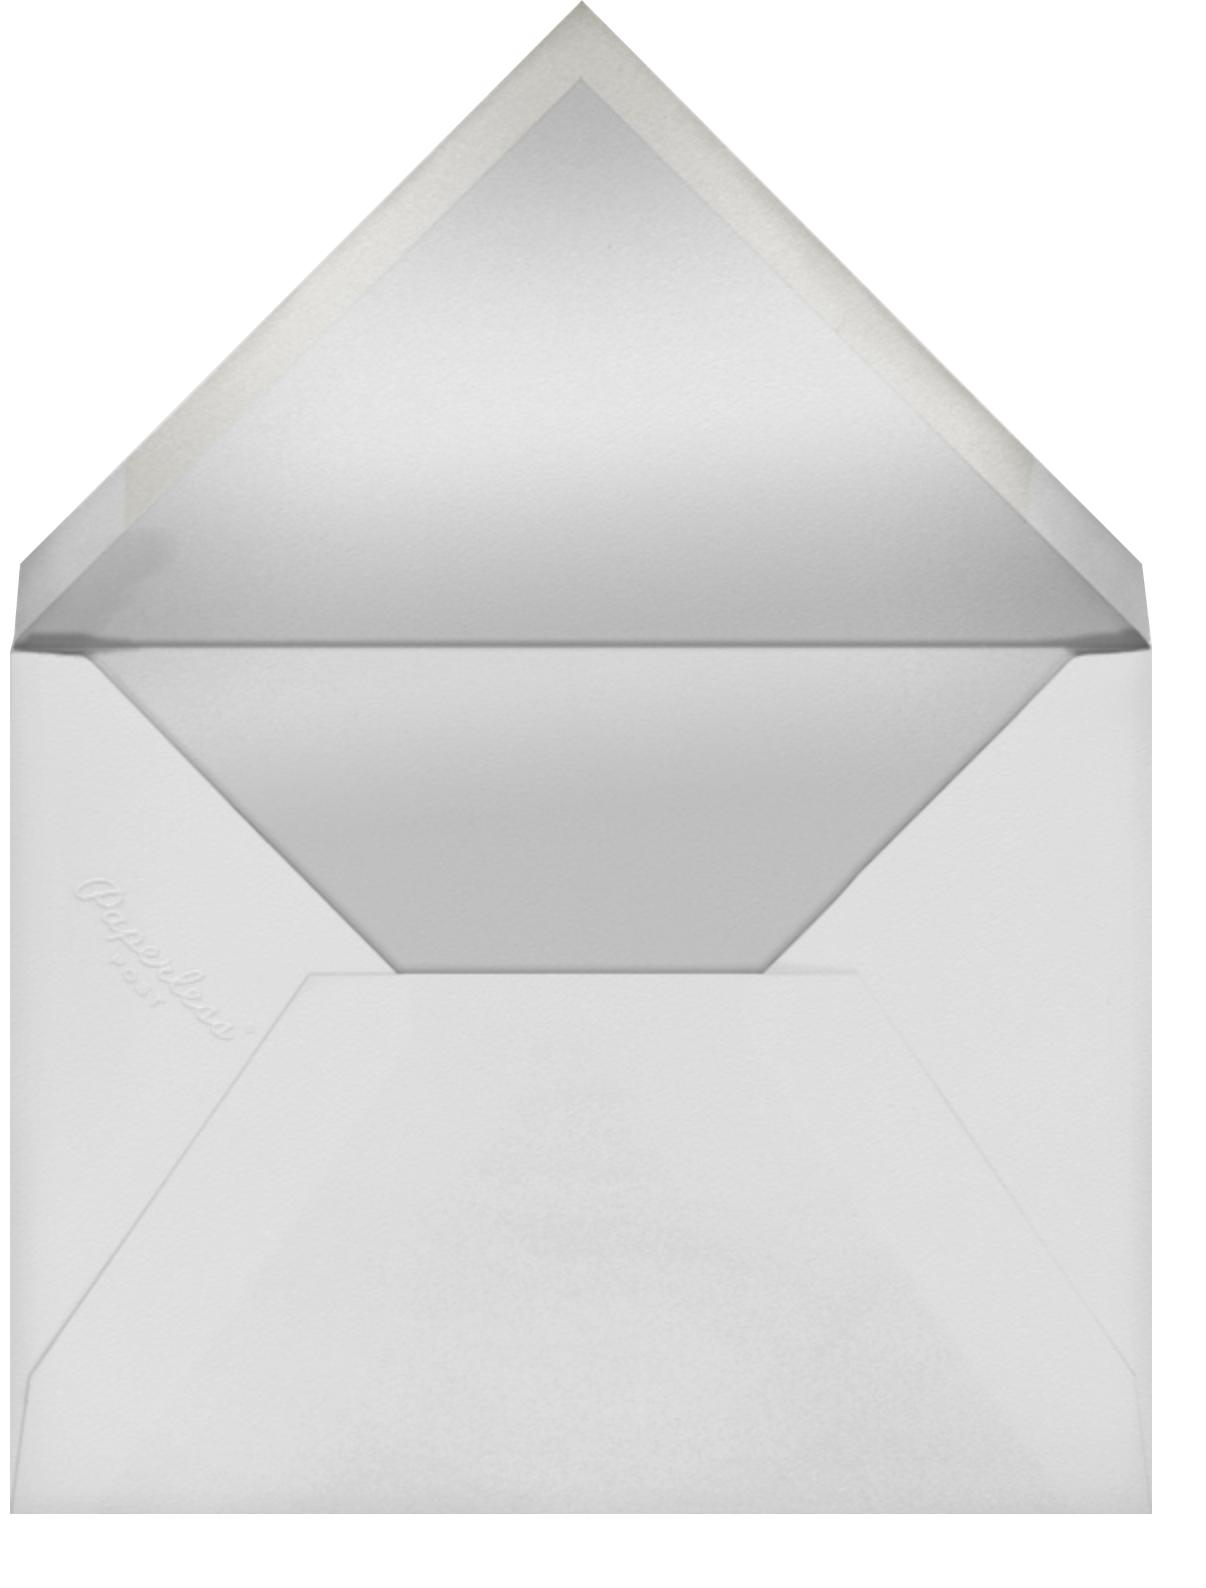 Miss Golden Gate (Menu)  - Mr. Boddington's Studio - Envelope